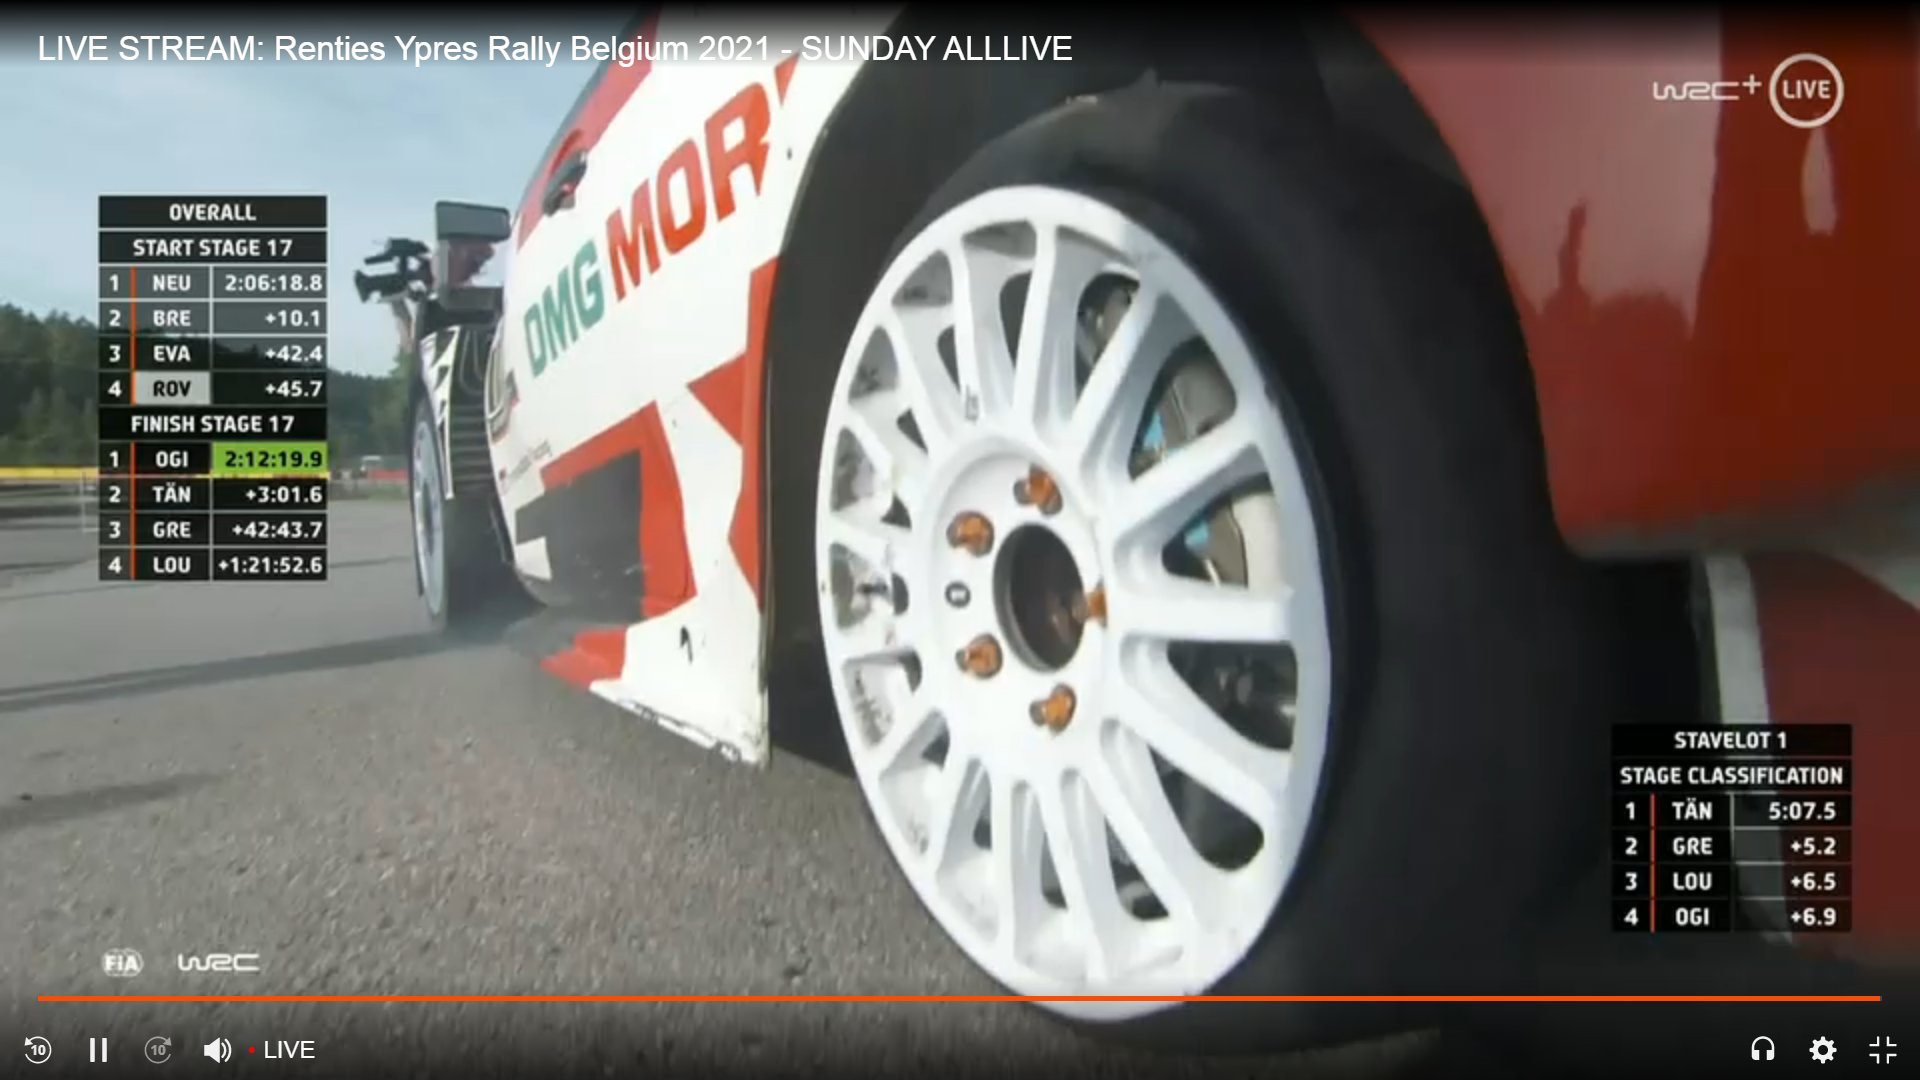 WRC: RENTIES Ypres Rally [13-15 Agosto] - Página 4 E80AexbWQAESJW4?format=jpg&name=large